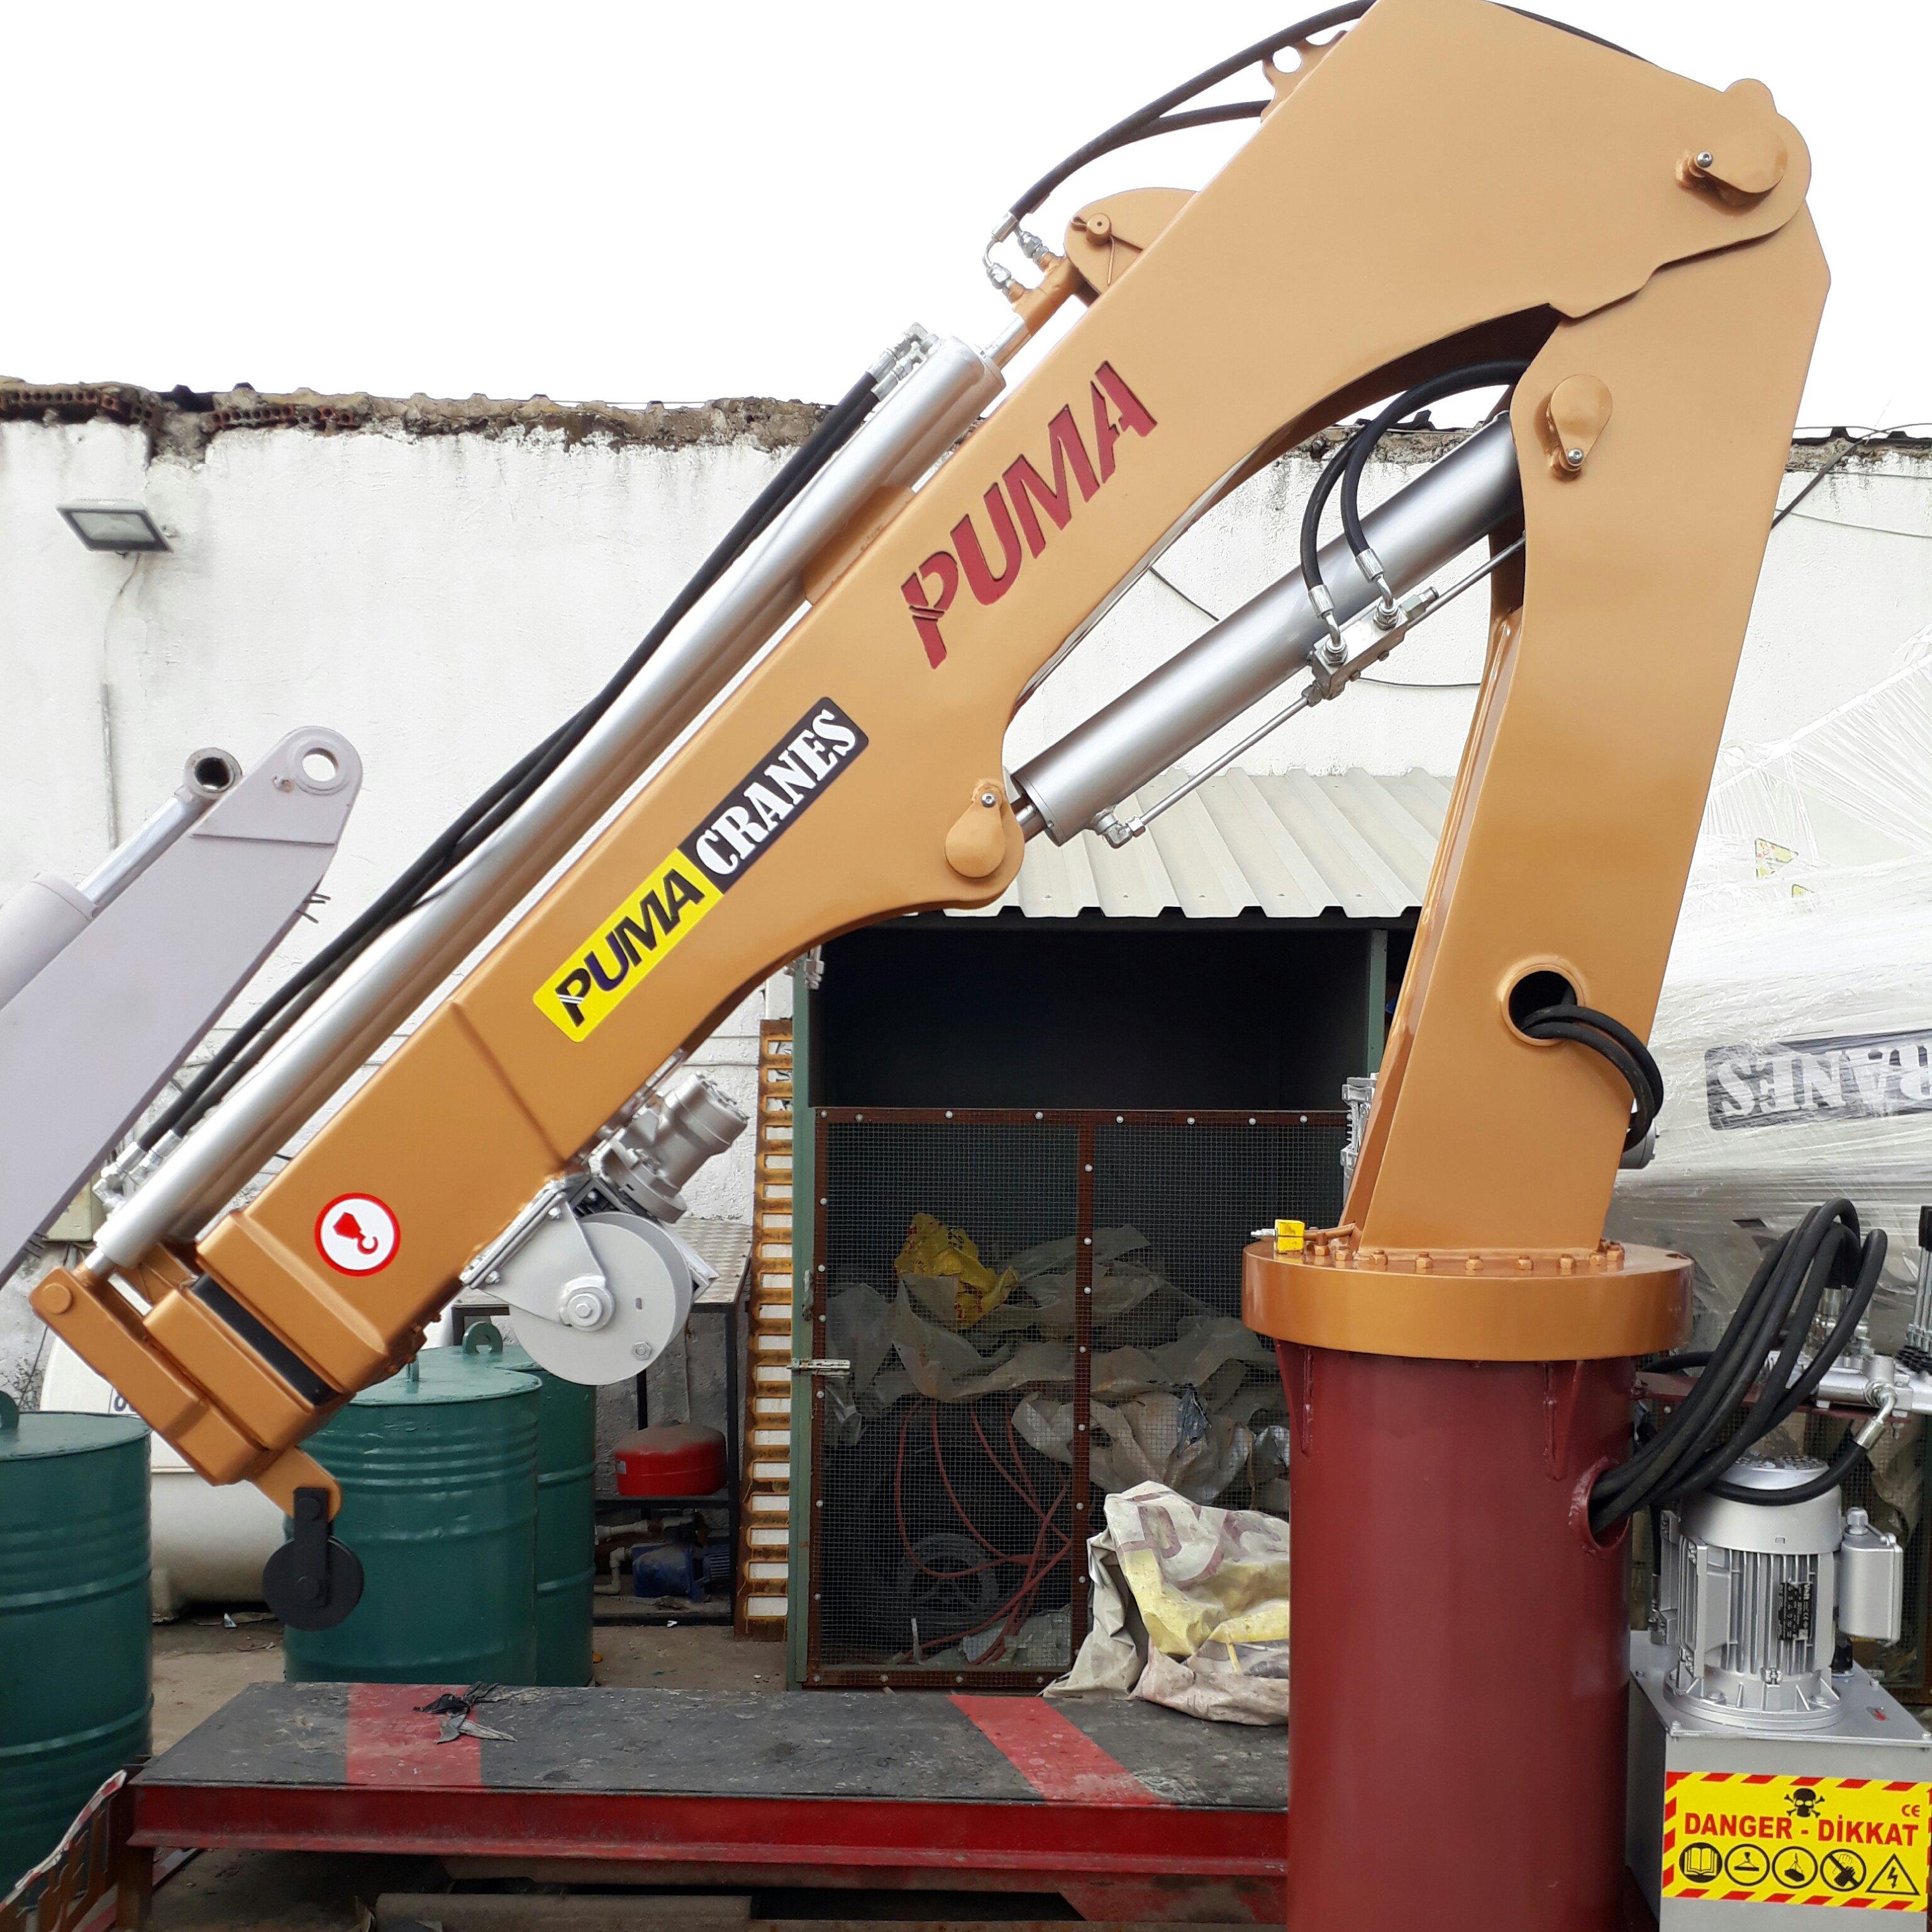 puma-marine-crane379424.jpg